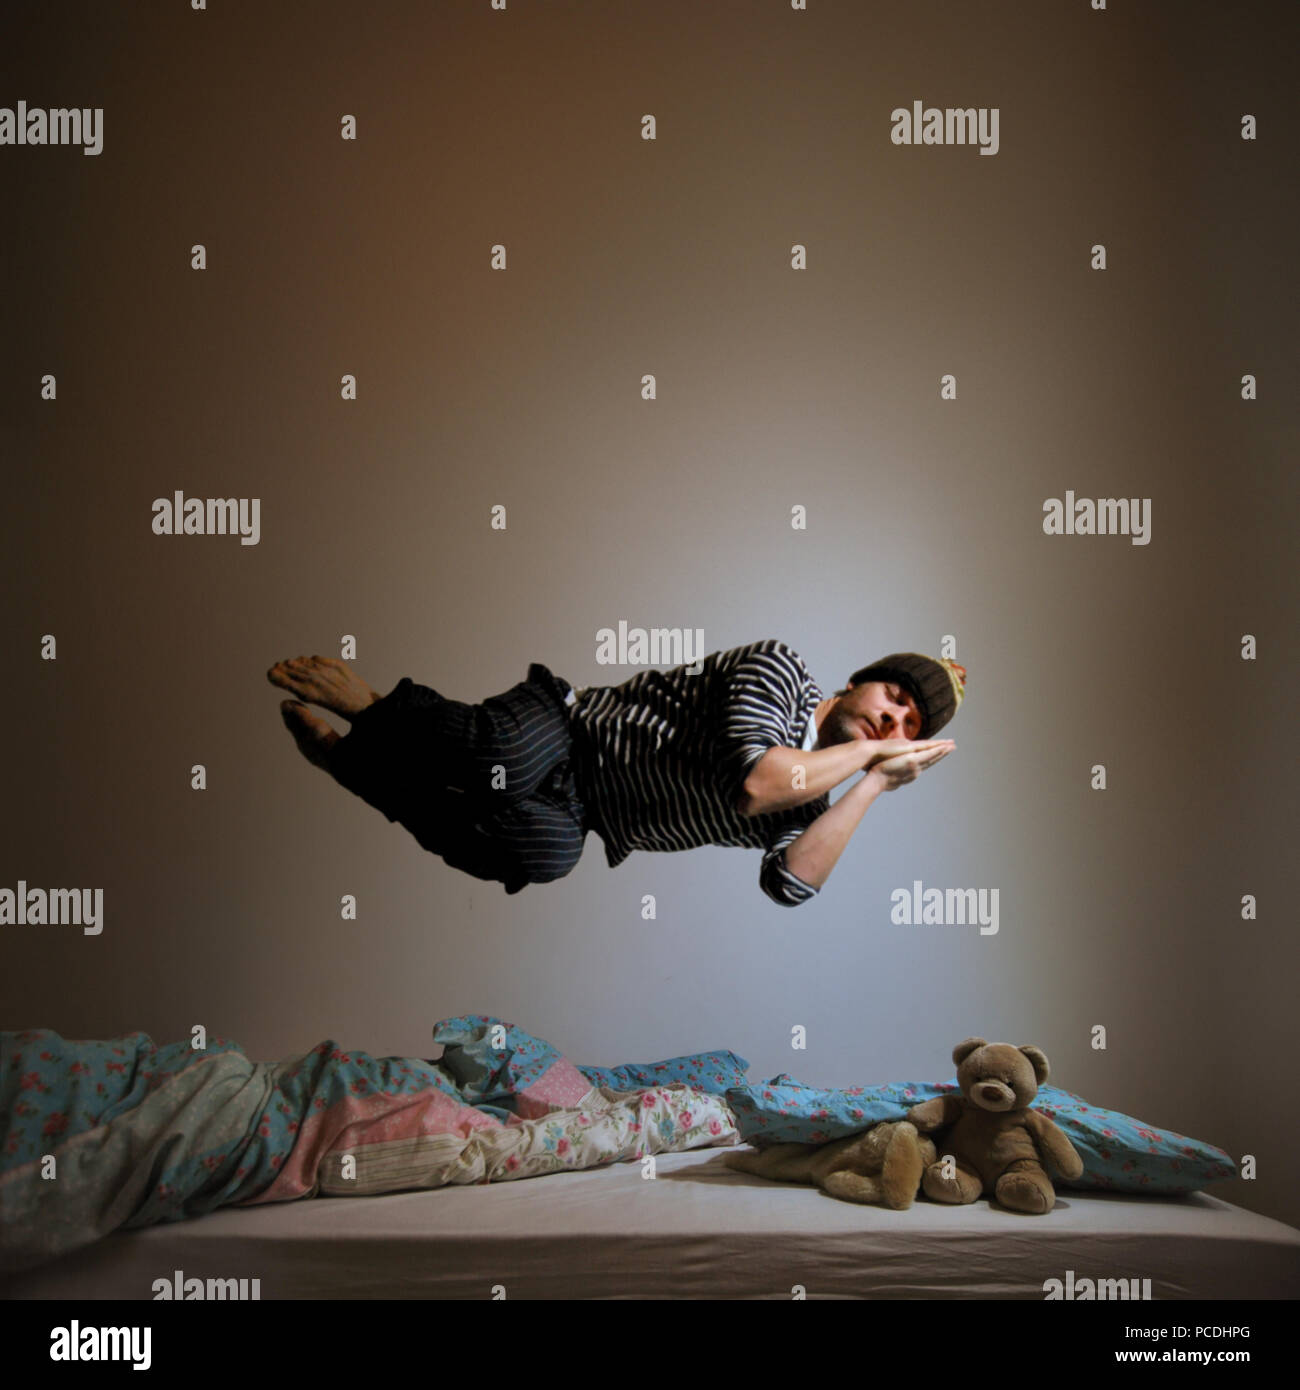 Träumen, schlafen, träumen Stockbild